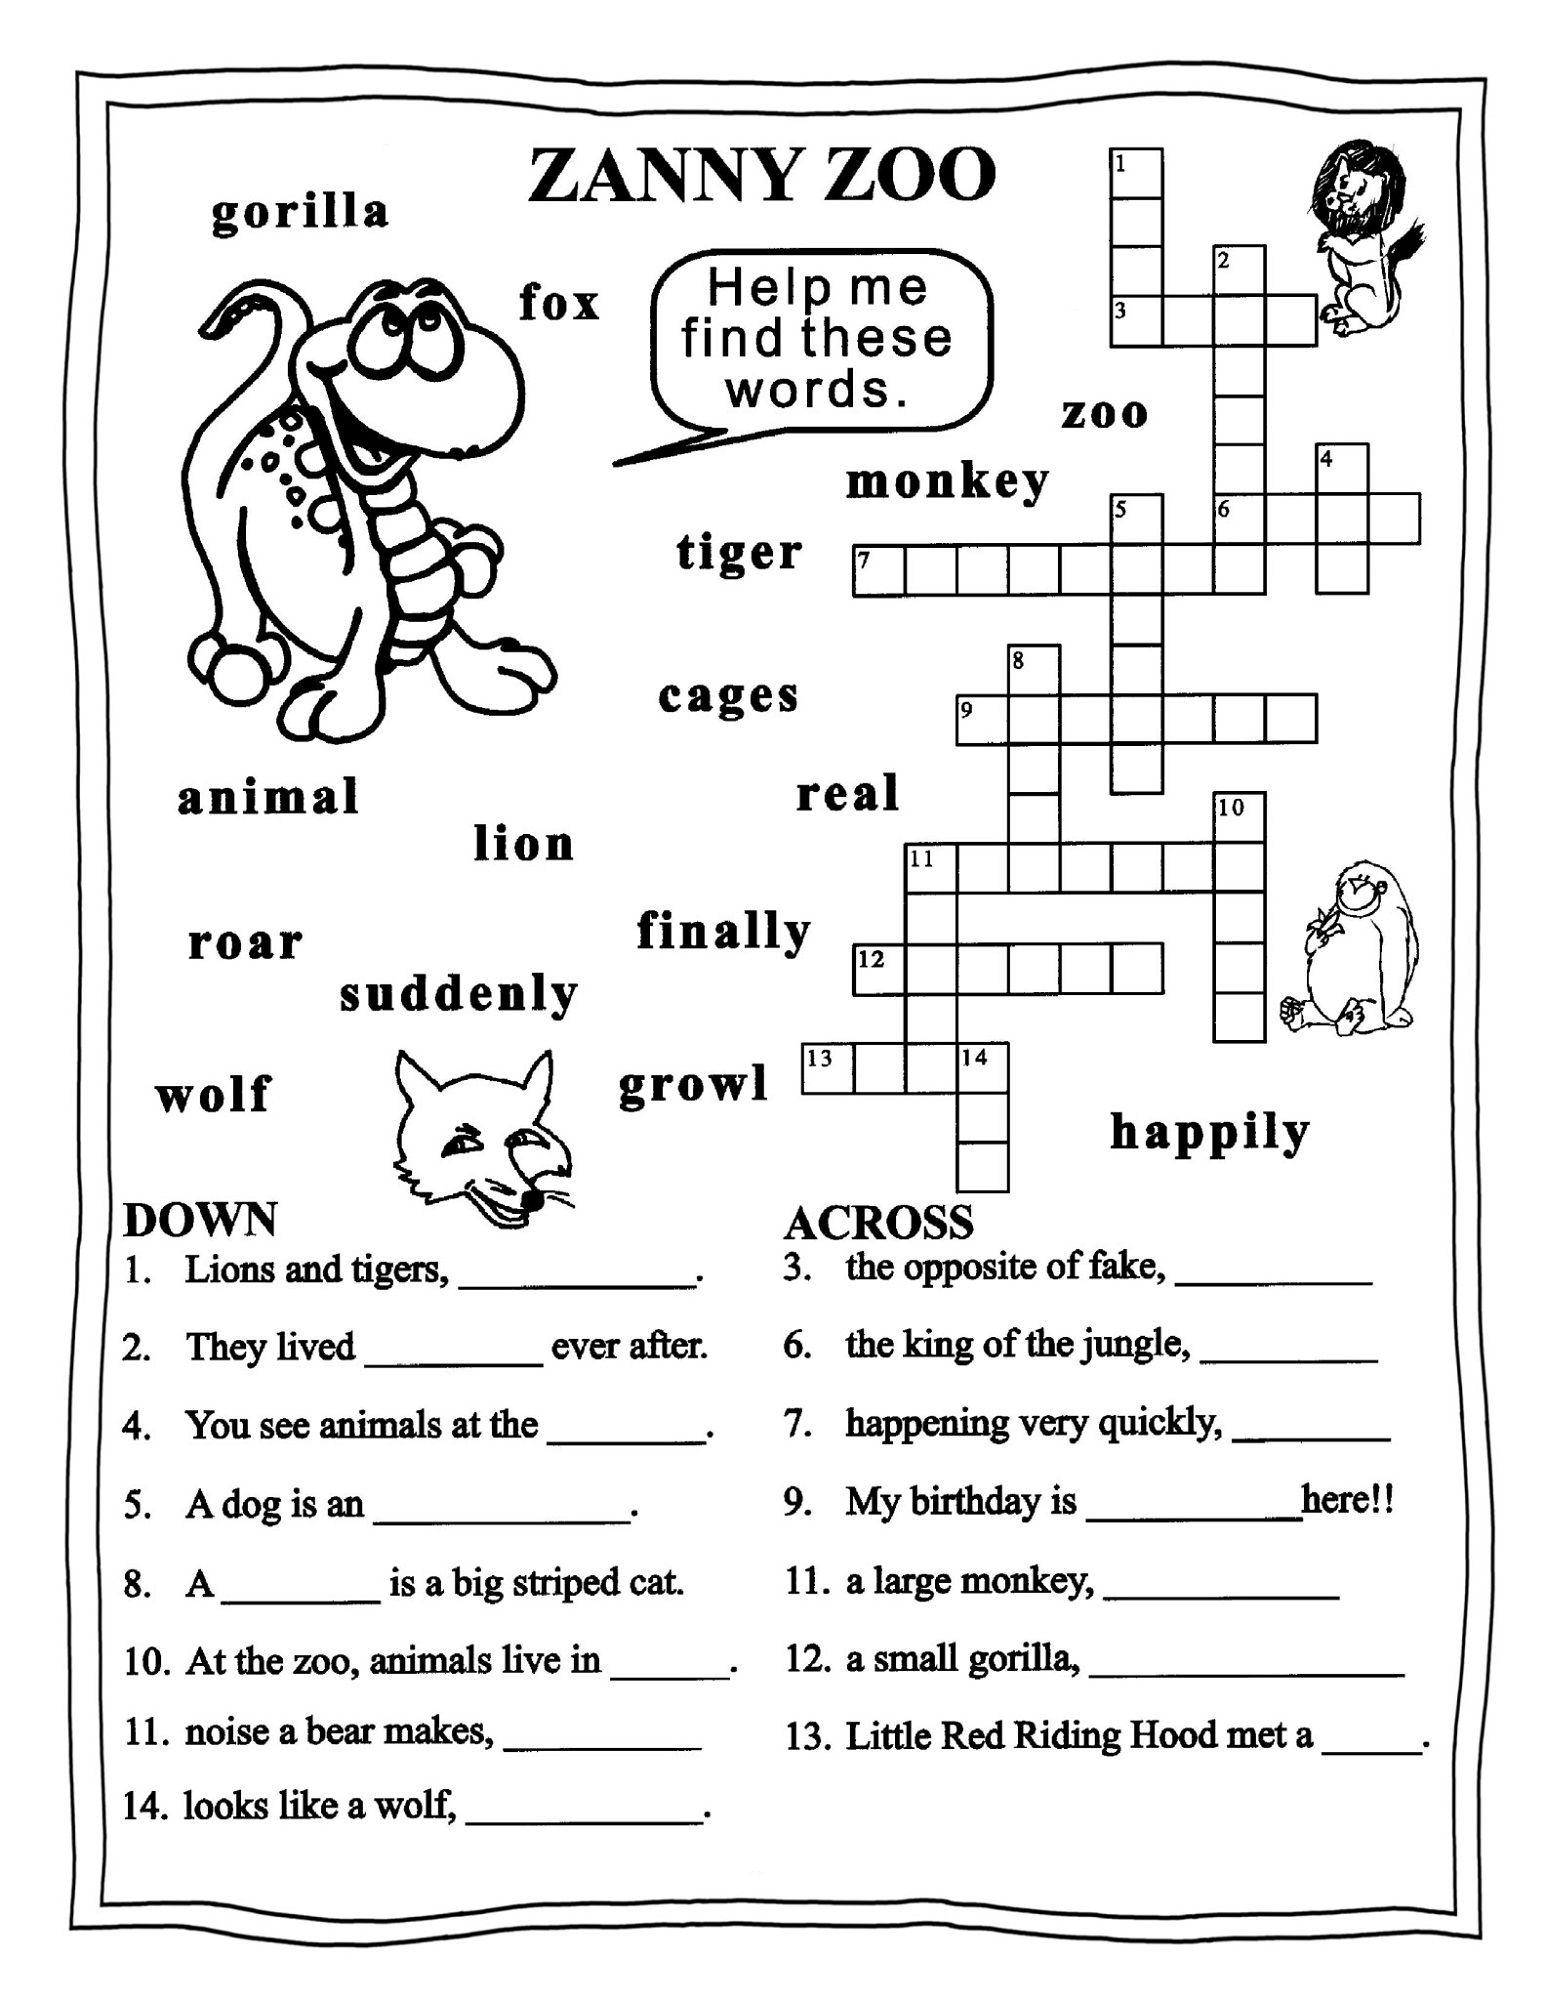 Worksheets For Grade 3 English | Learning Printable | Educative - Printable Ela Puzzles